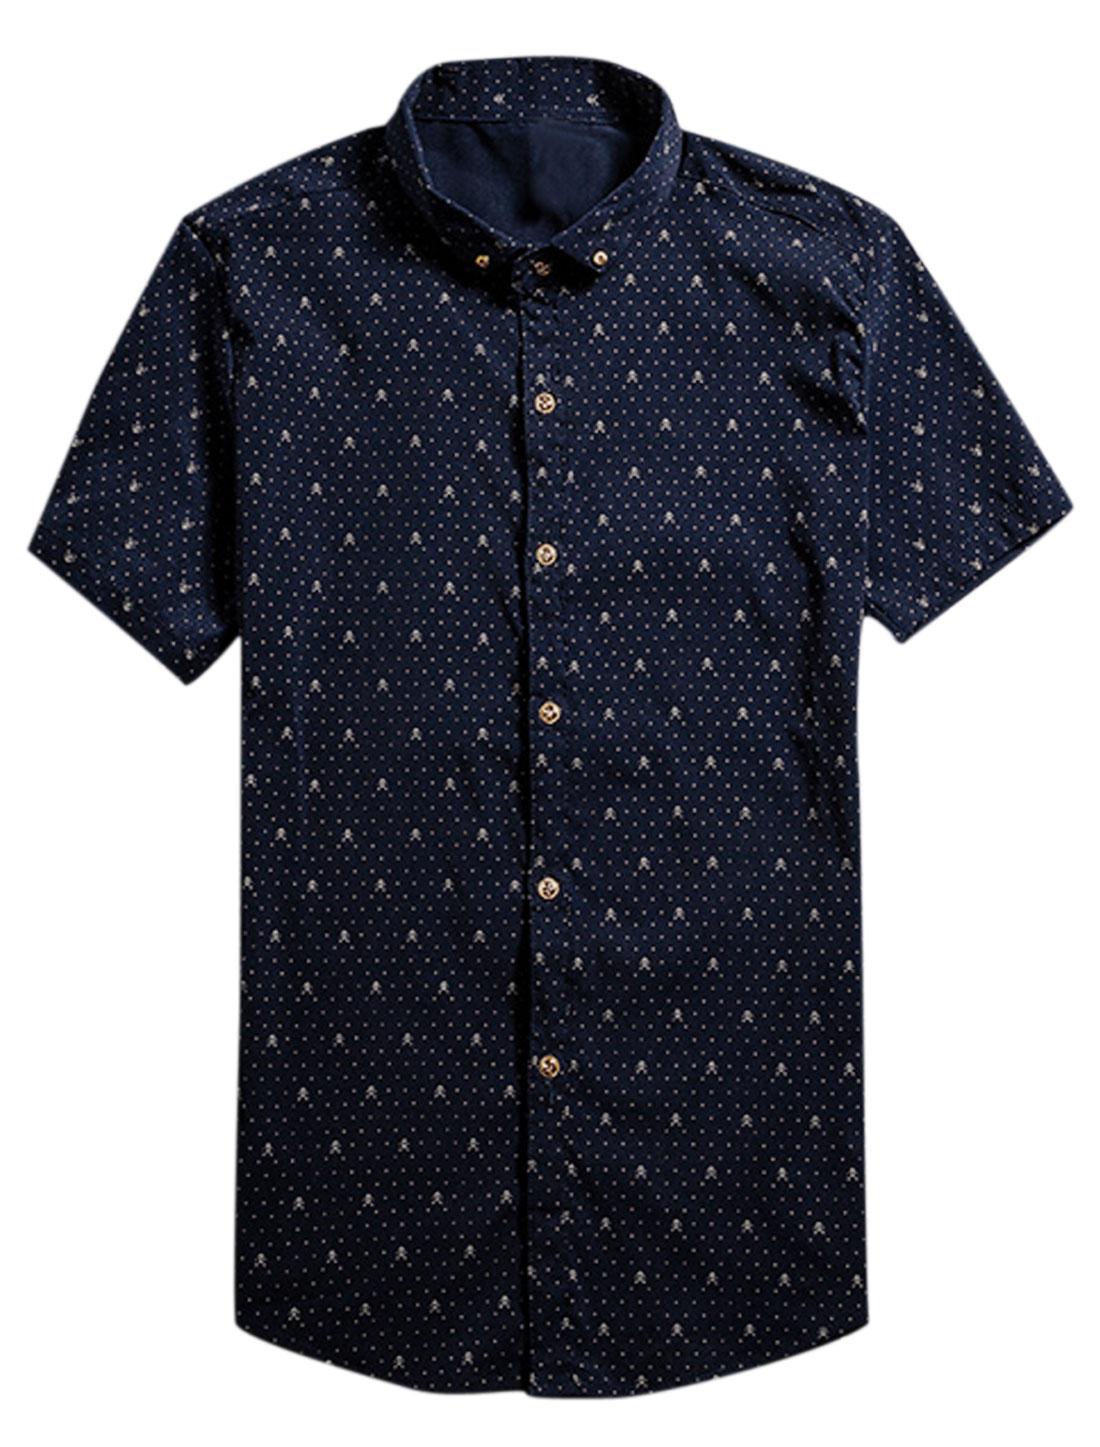 Men Short Sleeve Point Collar Dots Print Button Down Shirts Navy Blue S